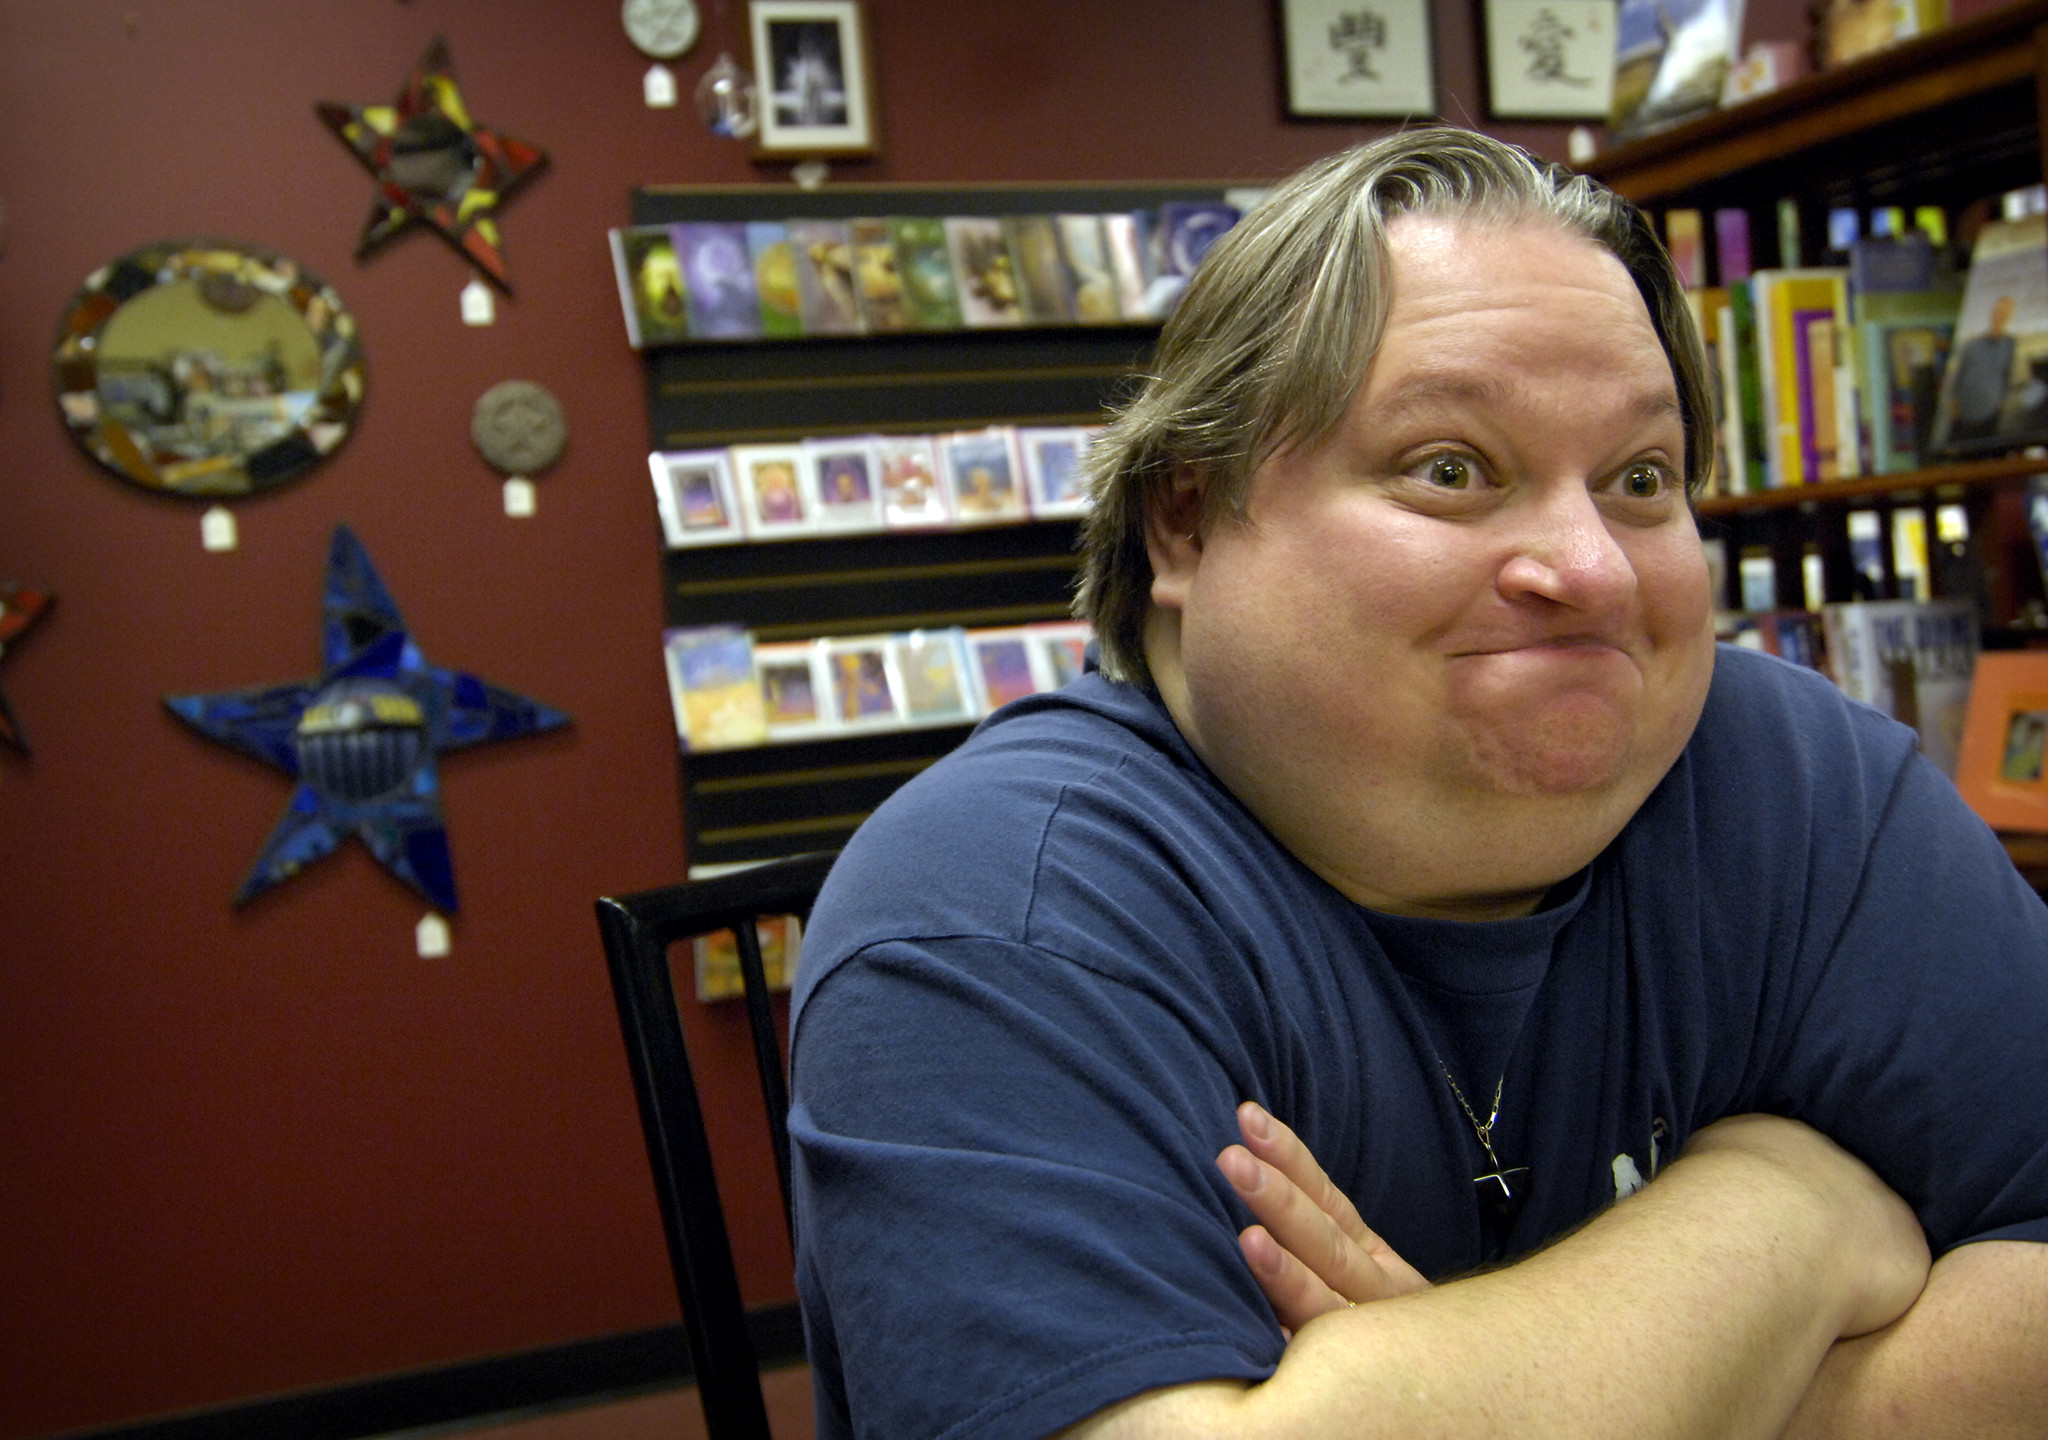 Mega Millions winner Ellwood 'Bunky' Bartlett says life of a